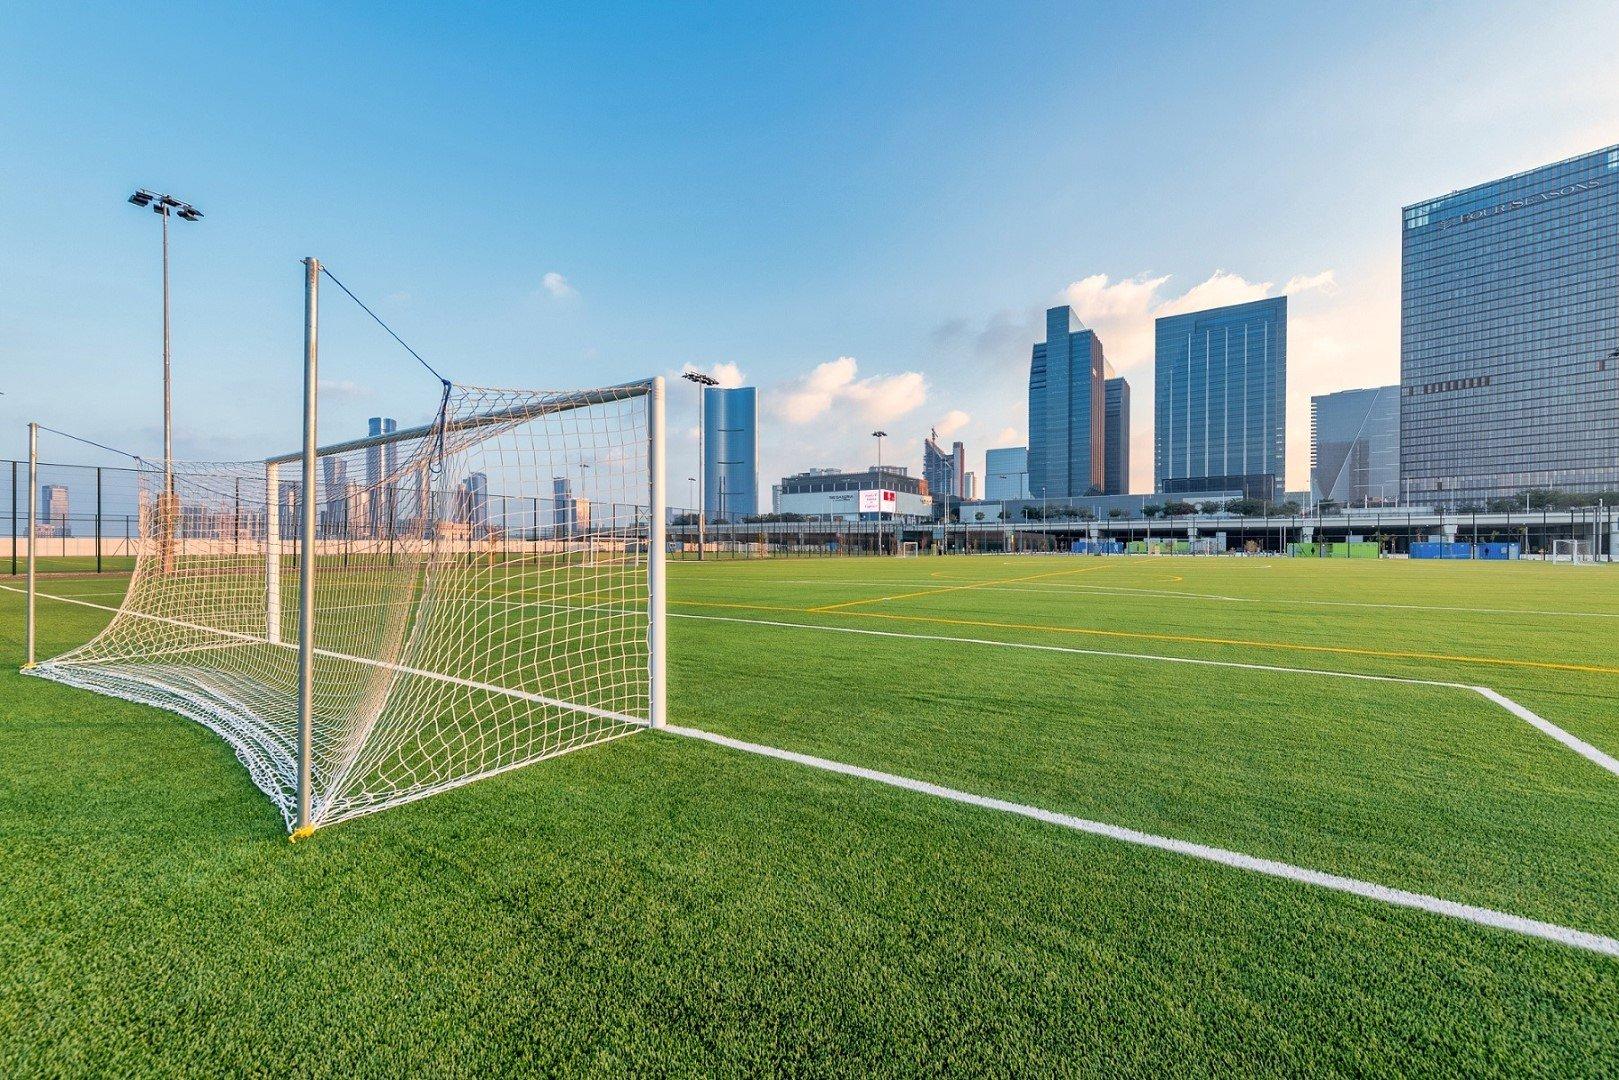 ACTIVE: the new world-class sports, recreation destination on Al Maryah Island